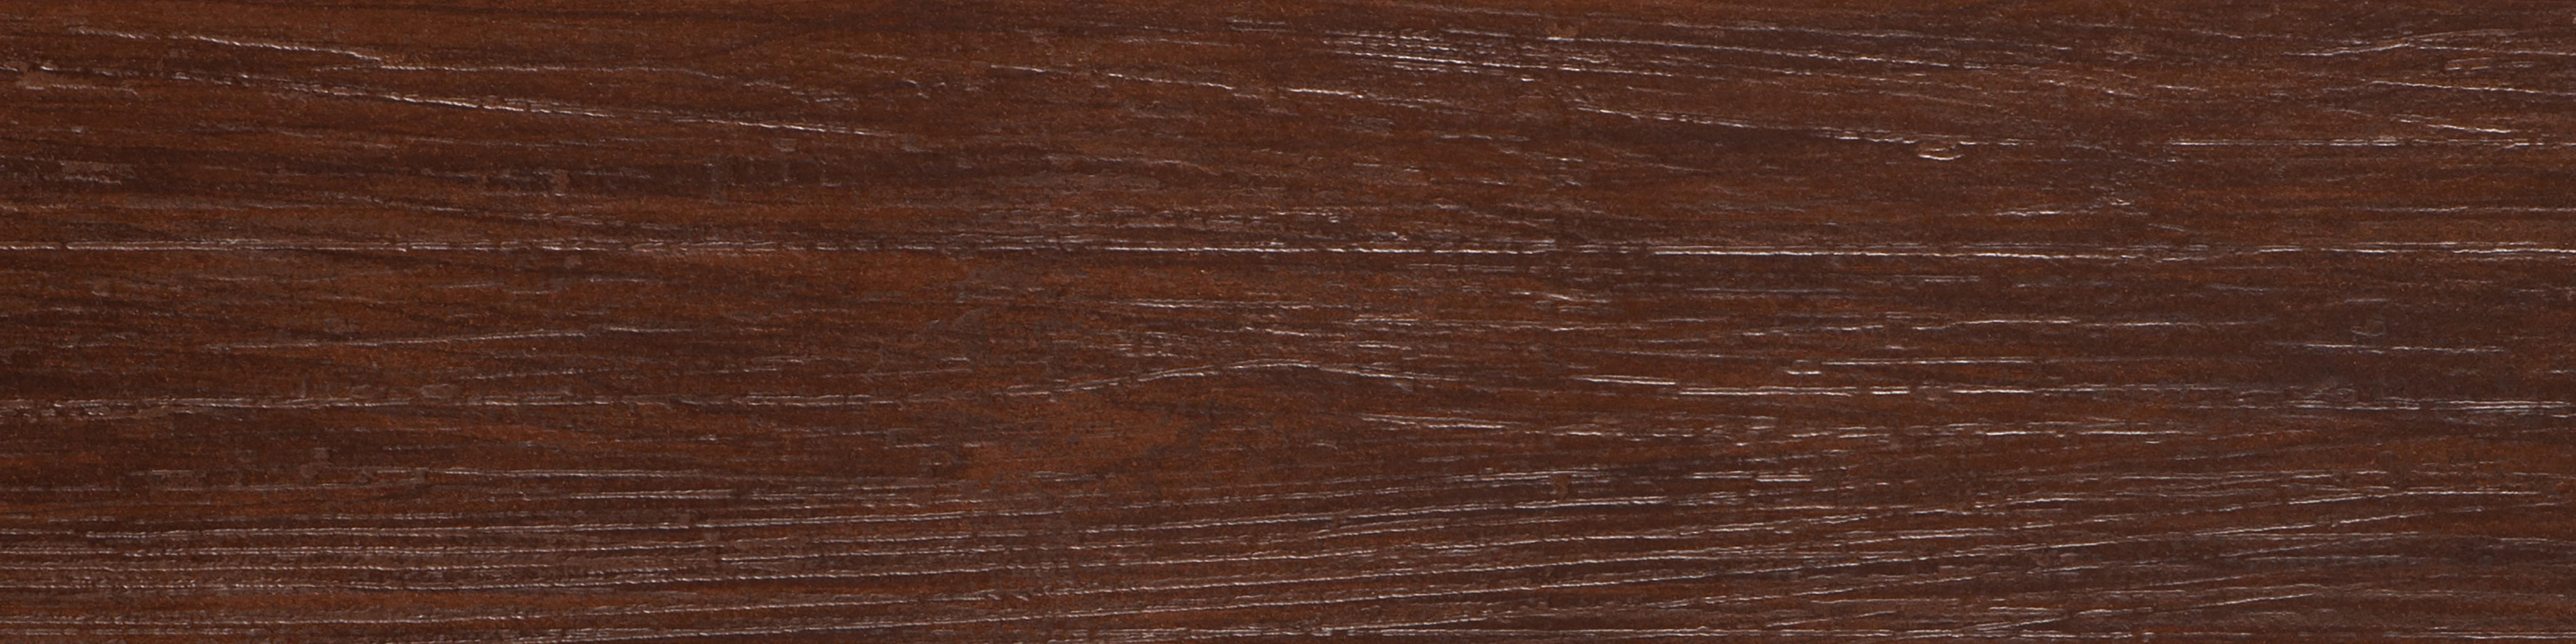 Плитка керамограніт MOOD WOOD 15x60 VENGE TEAK ZSXP8R